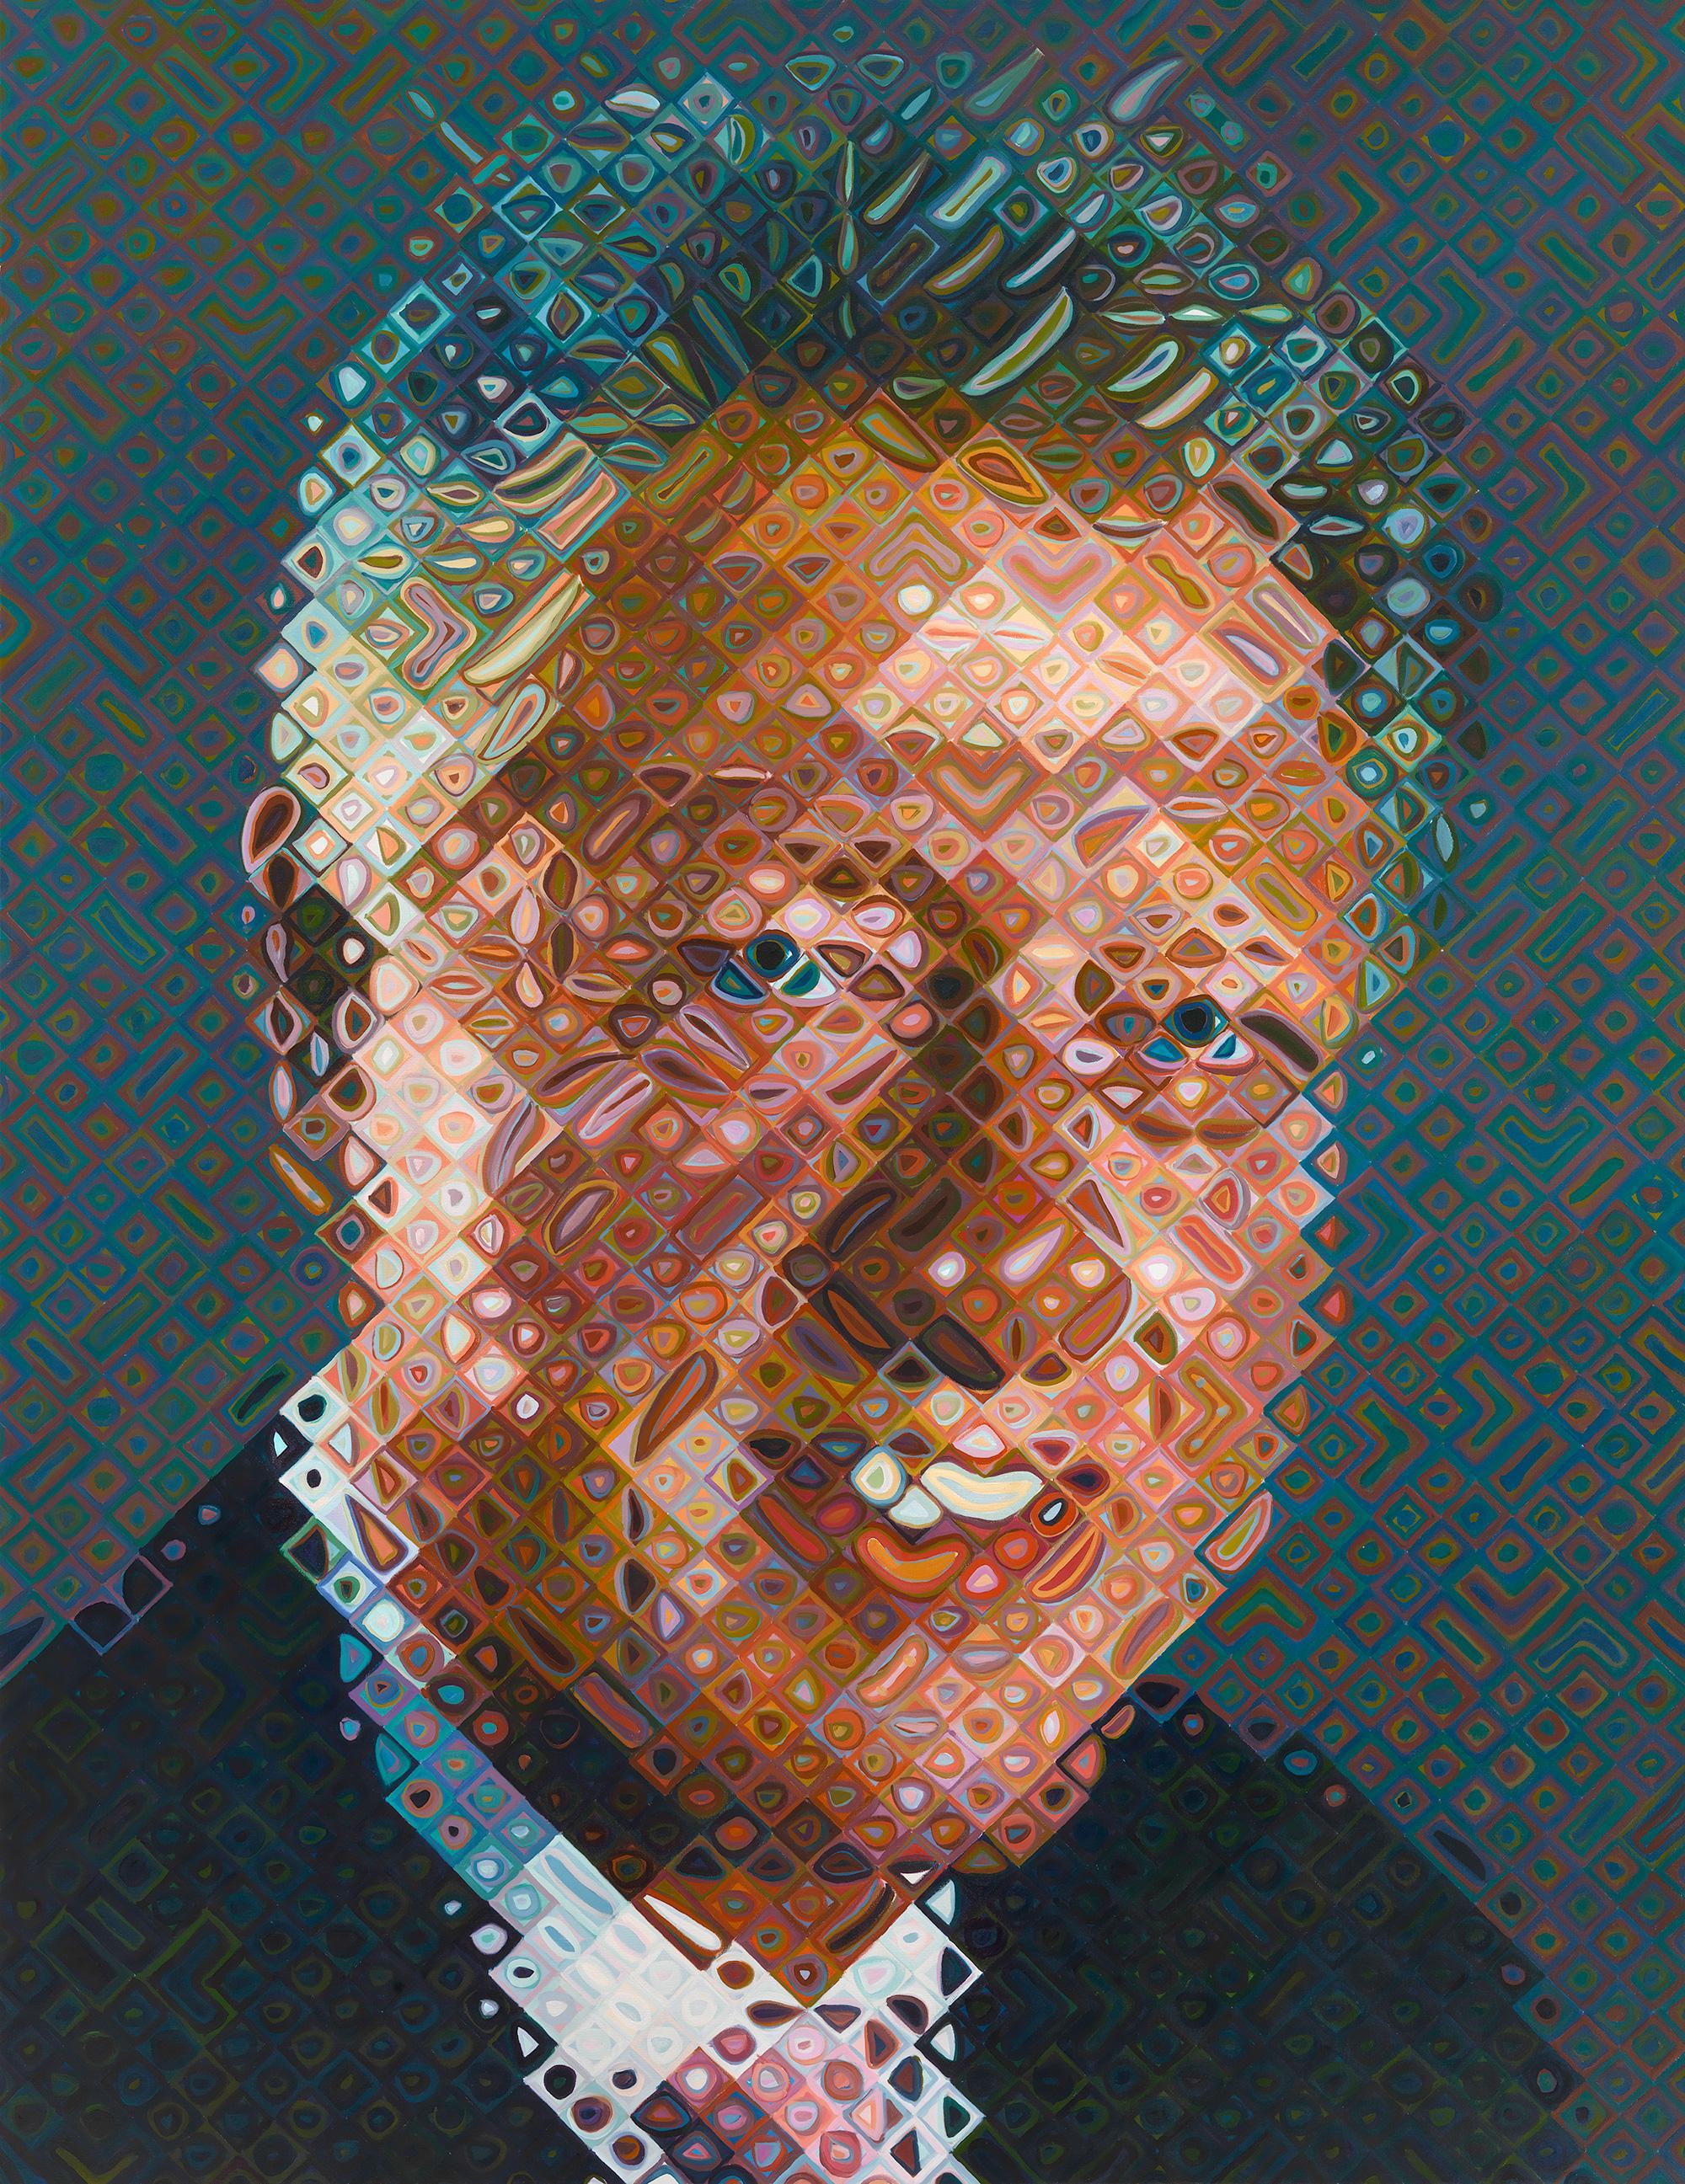 Clinton's Smithsonian portrait